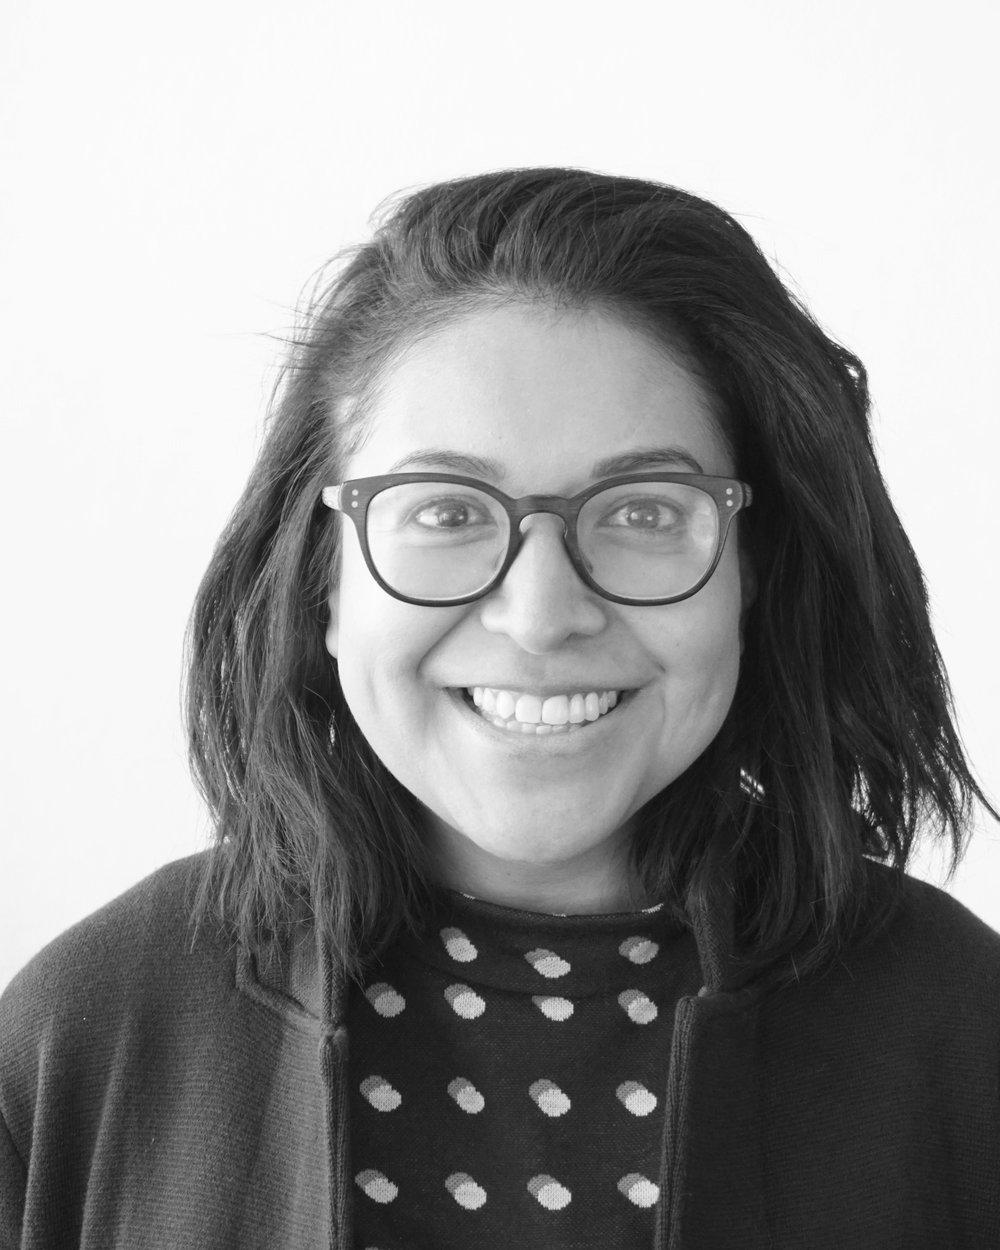 Yessenia Juarez, Designer